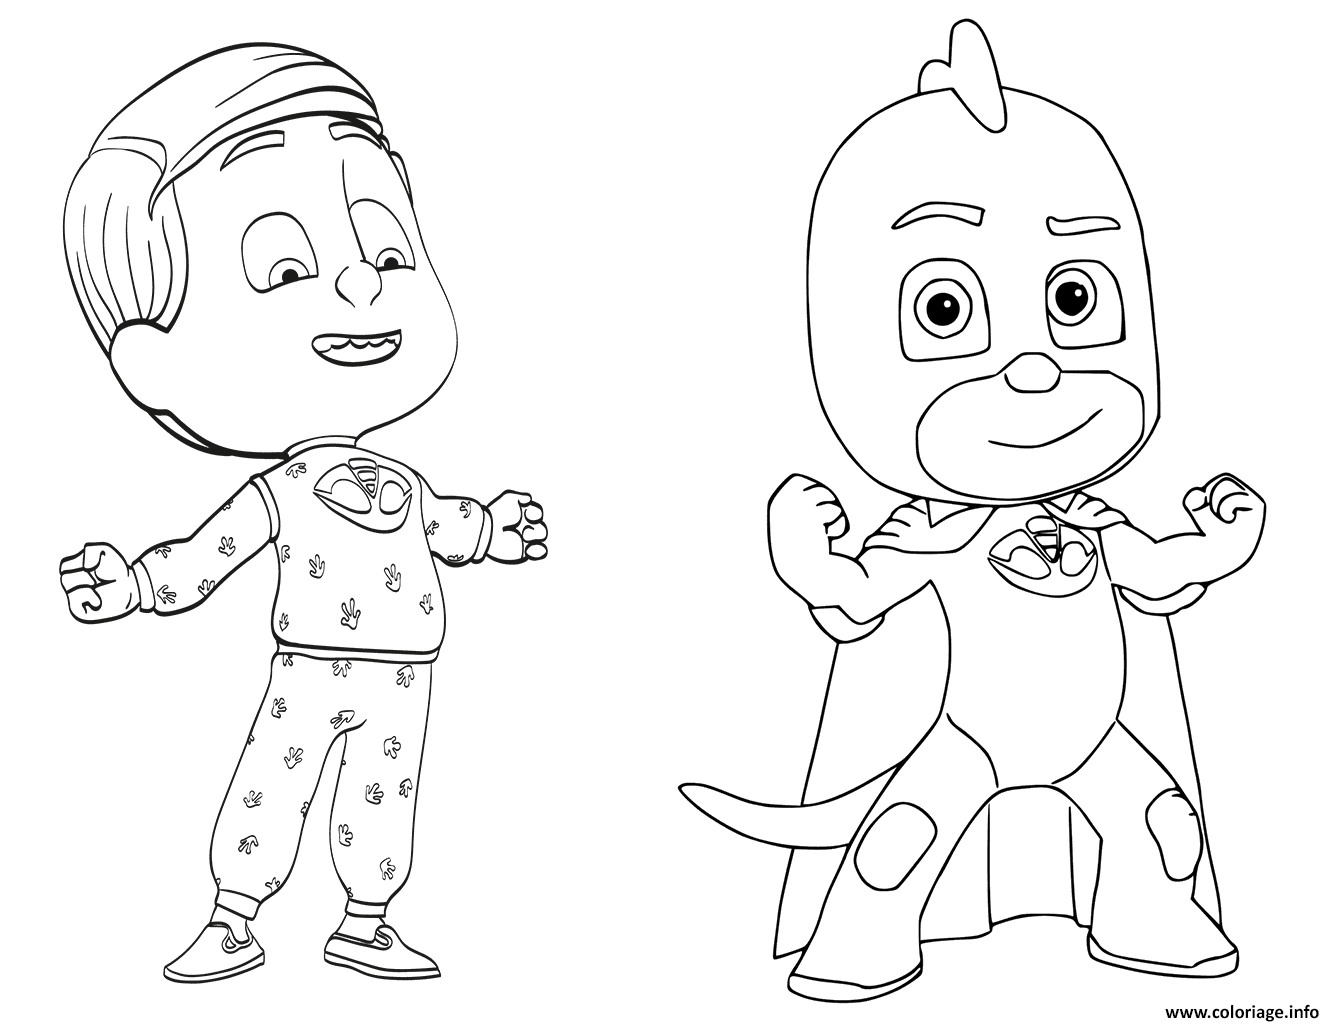 Coloriage Qg Pyjamasque.Coloriage Pyjamasques A Imprimer